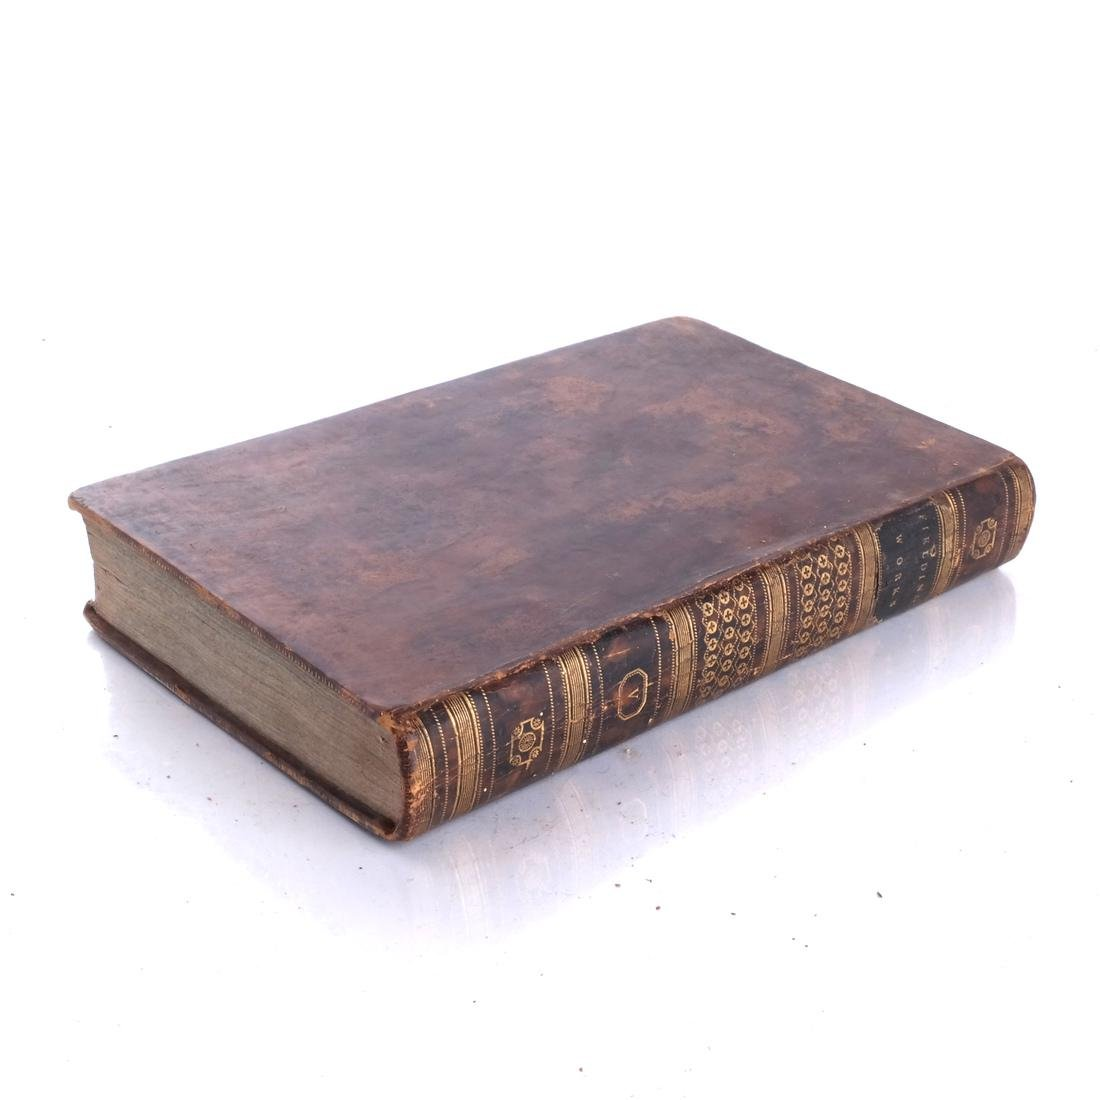 Books: 27+ Volumes - 6